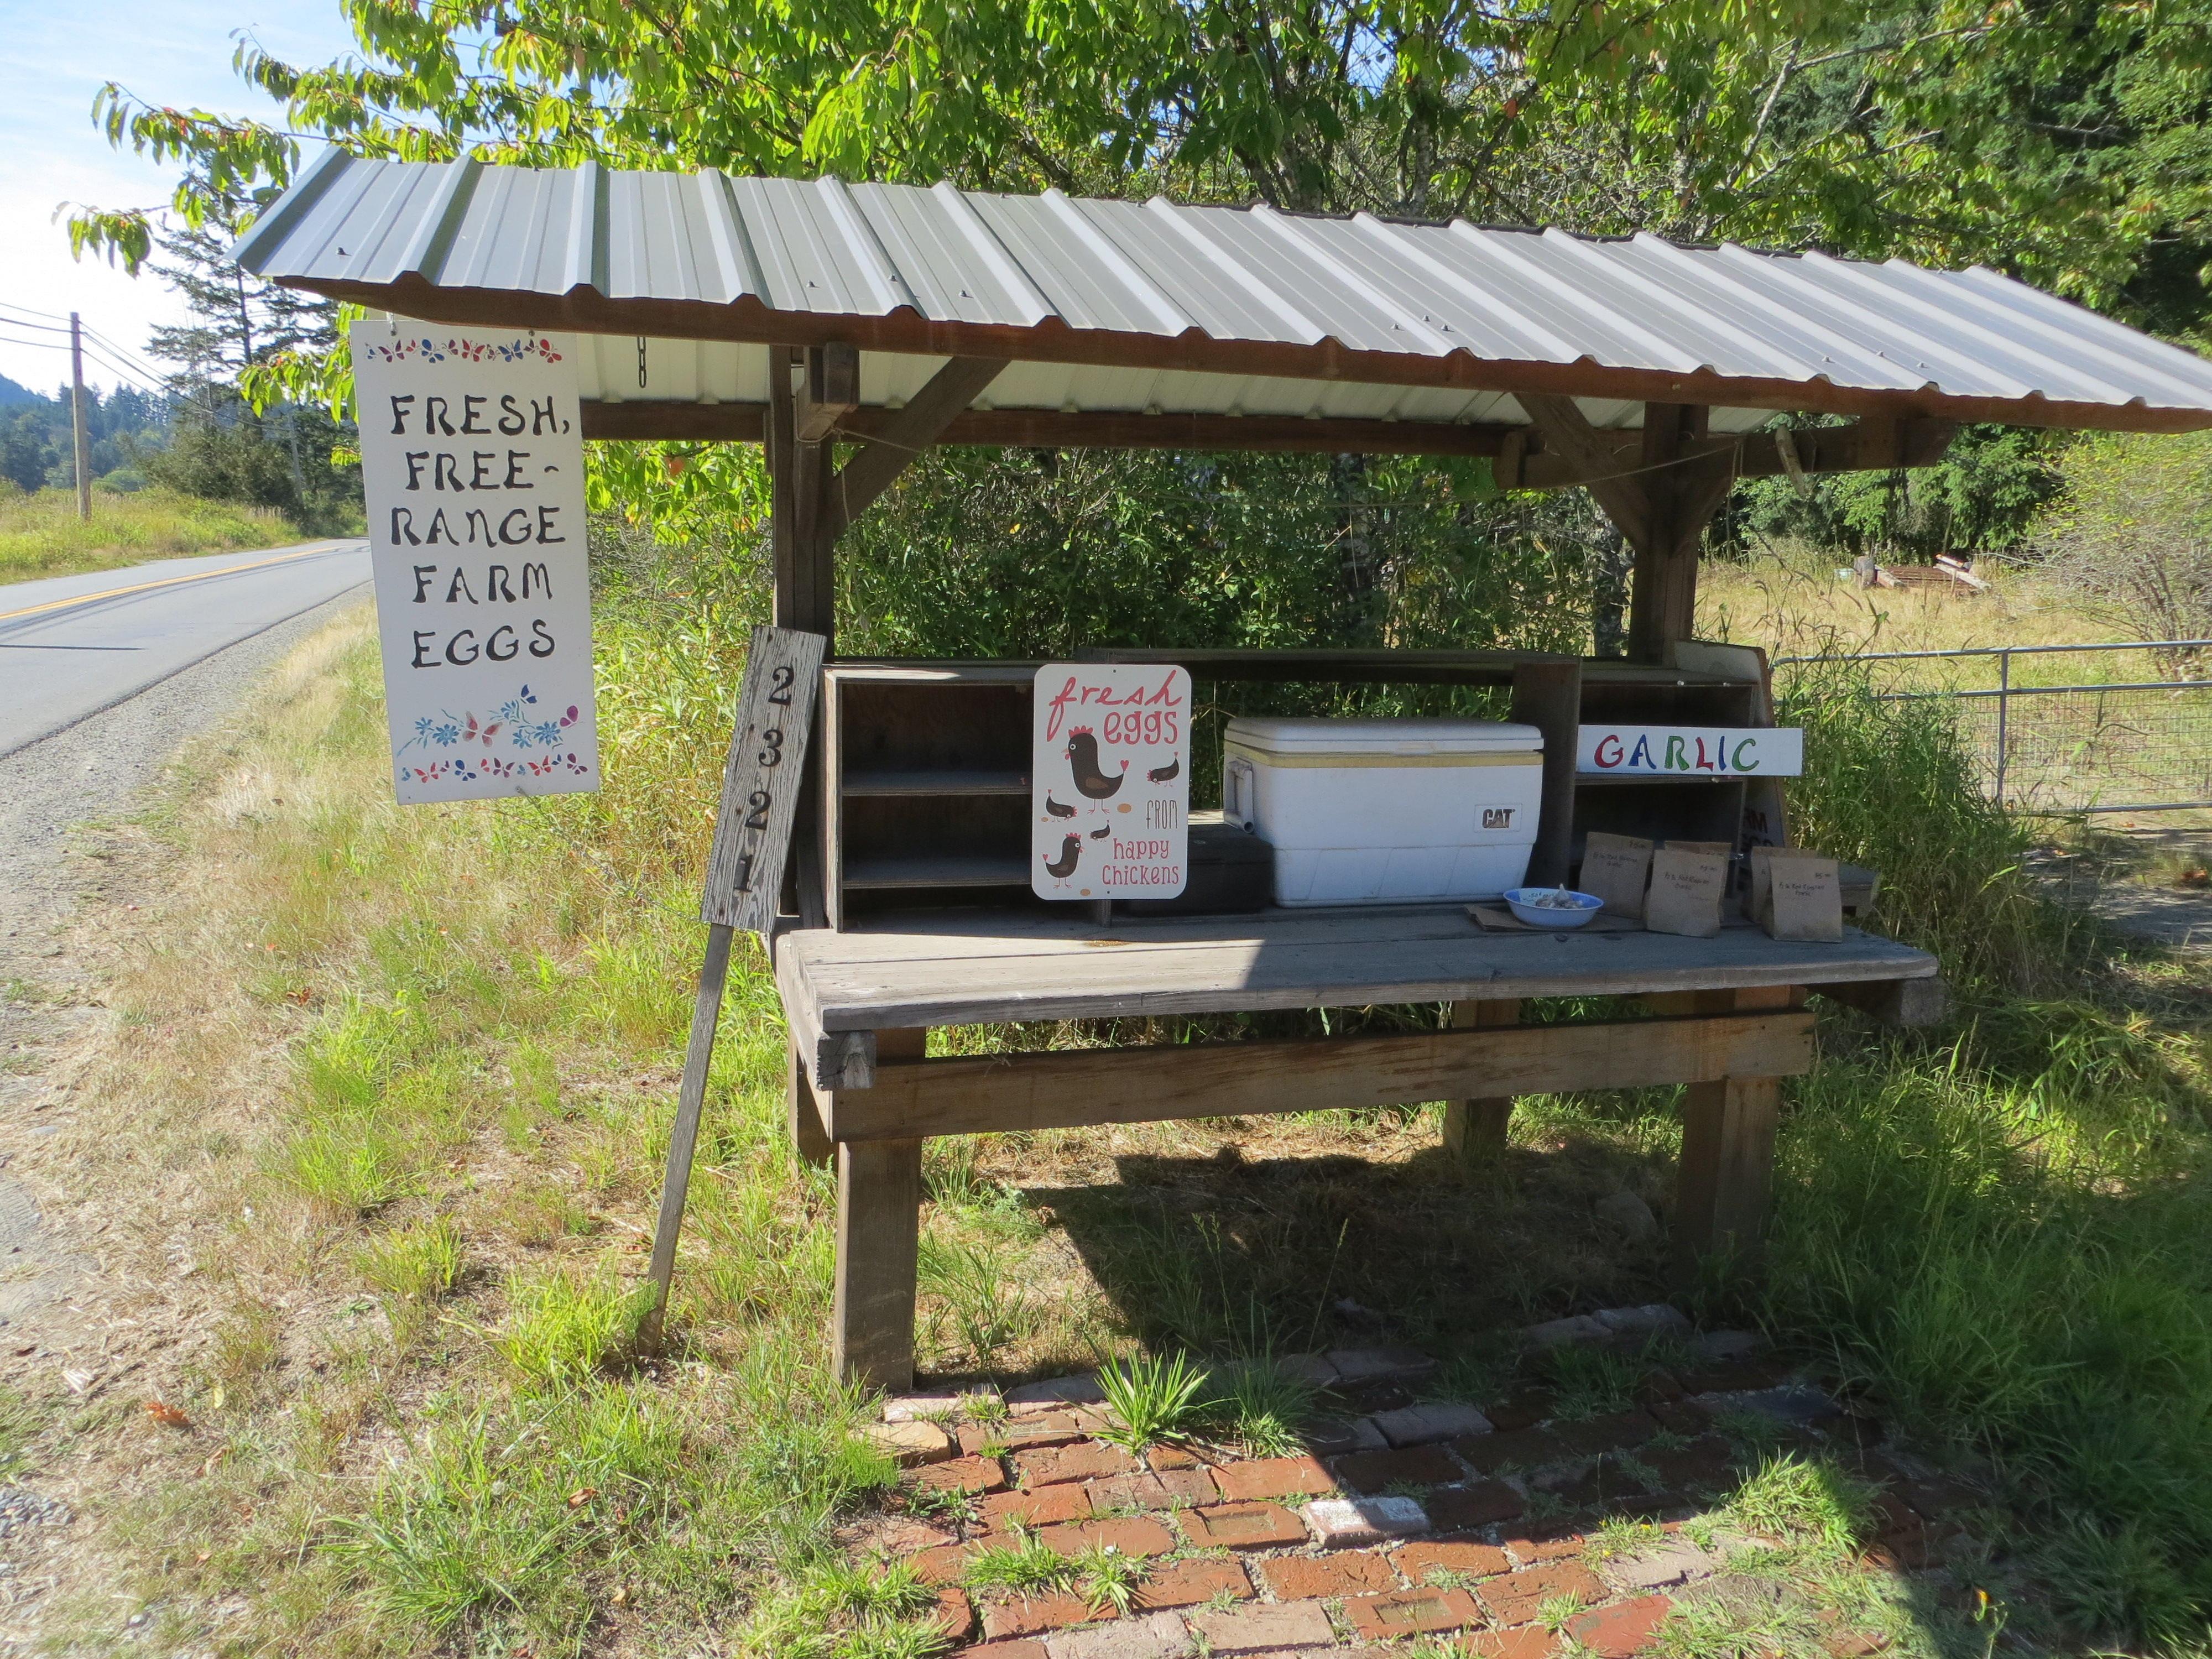 Fresh free-range farm eggs and garlic for sale at a self-serve farm stand on Salt Spring Island.